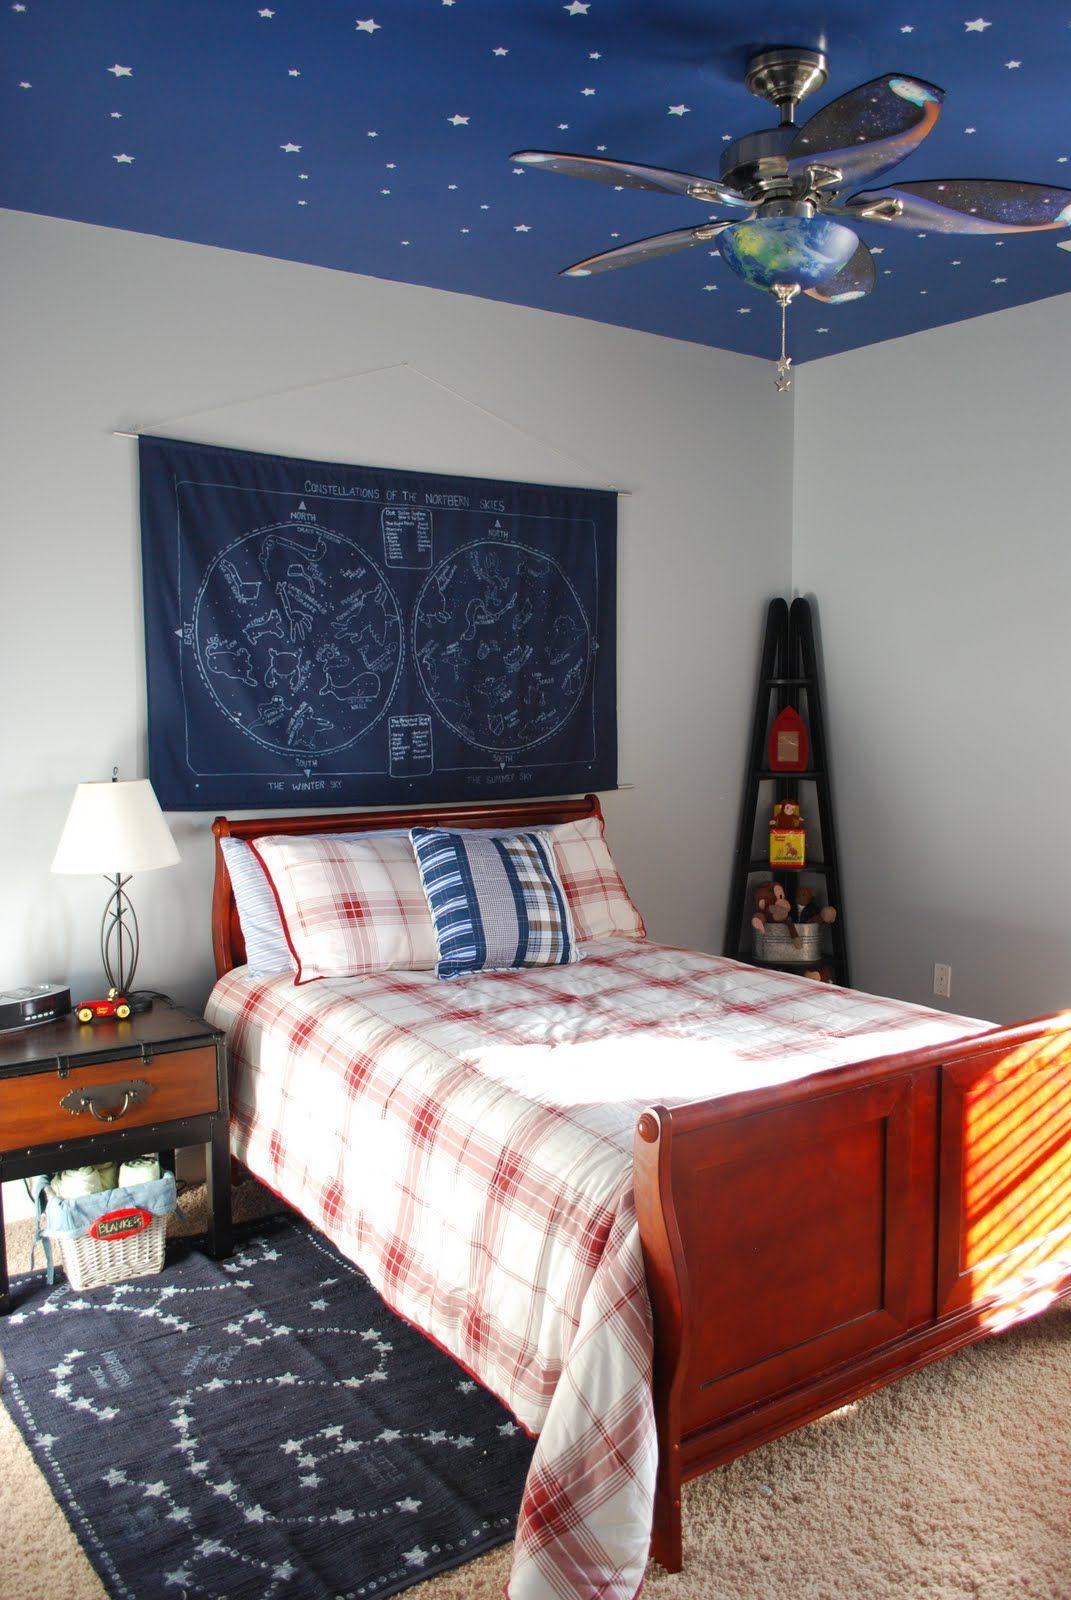 Beau +25 Marvelous Kidsu0027 Rooms Ceiling Designs Ideas